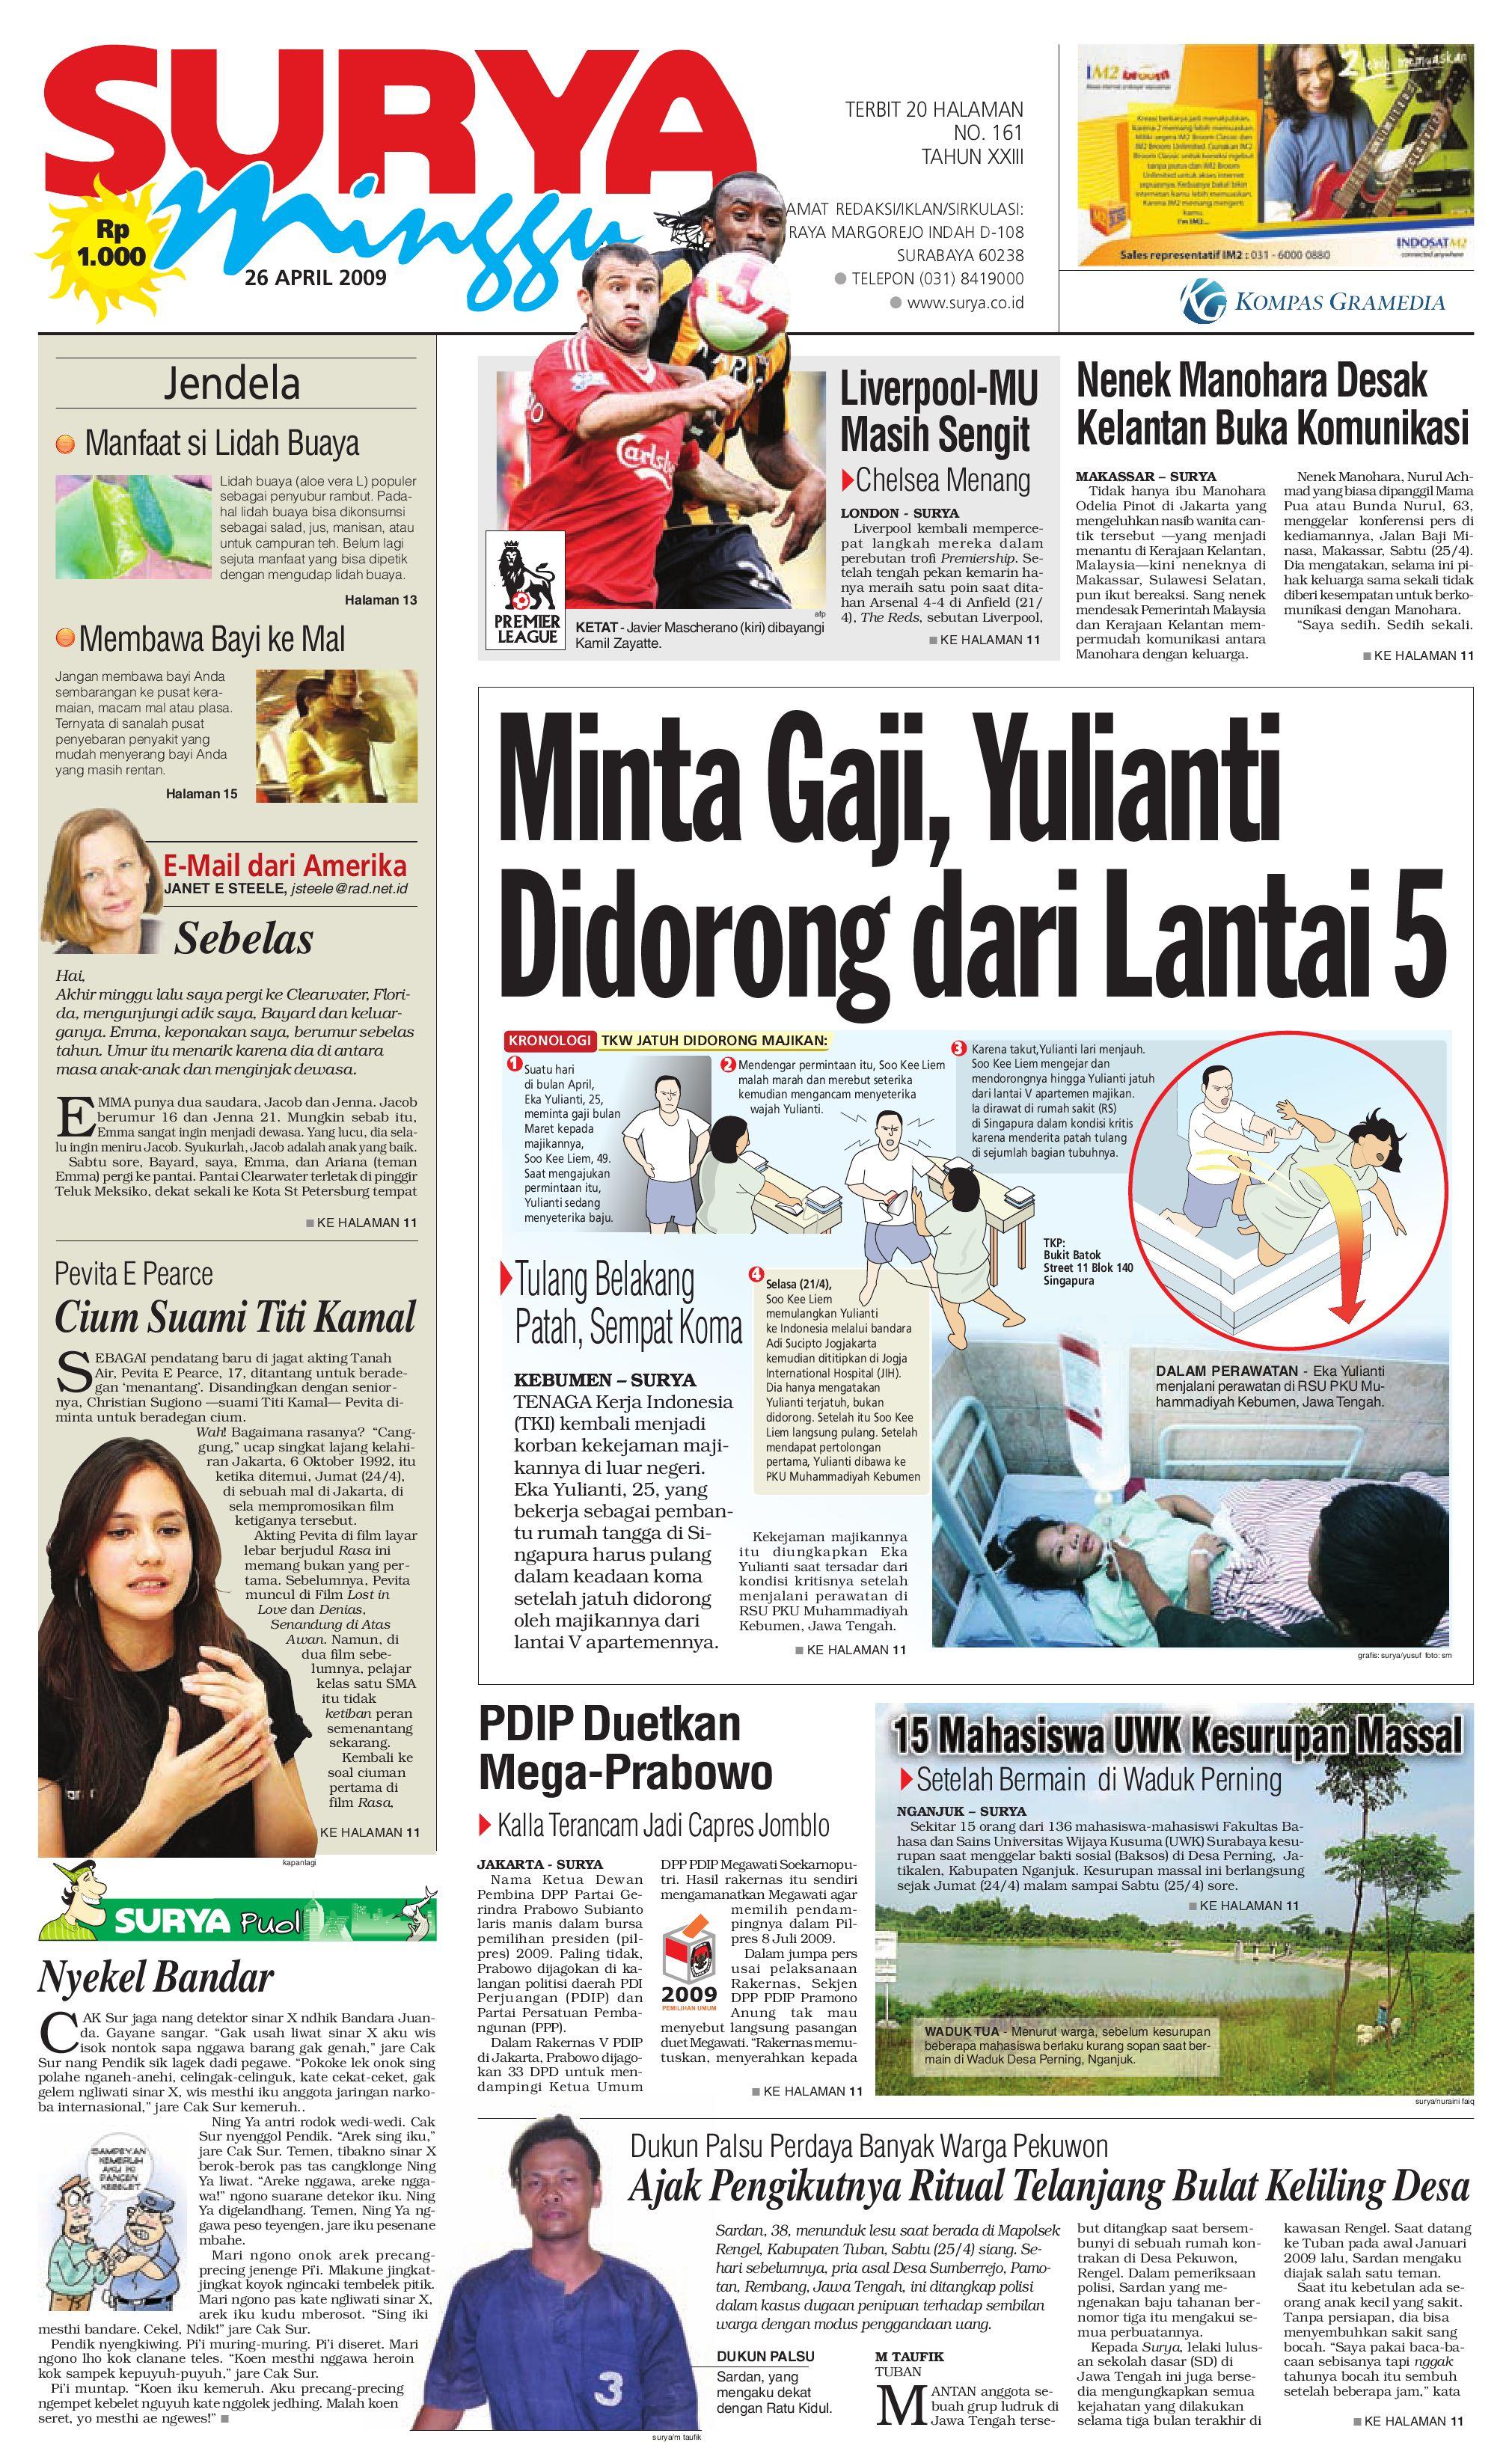 surya edisi cetak minggu 26 april 2009 by harian surya issuu